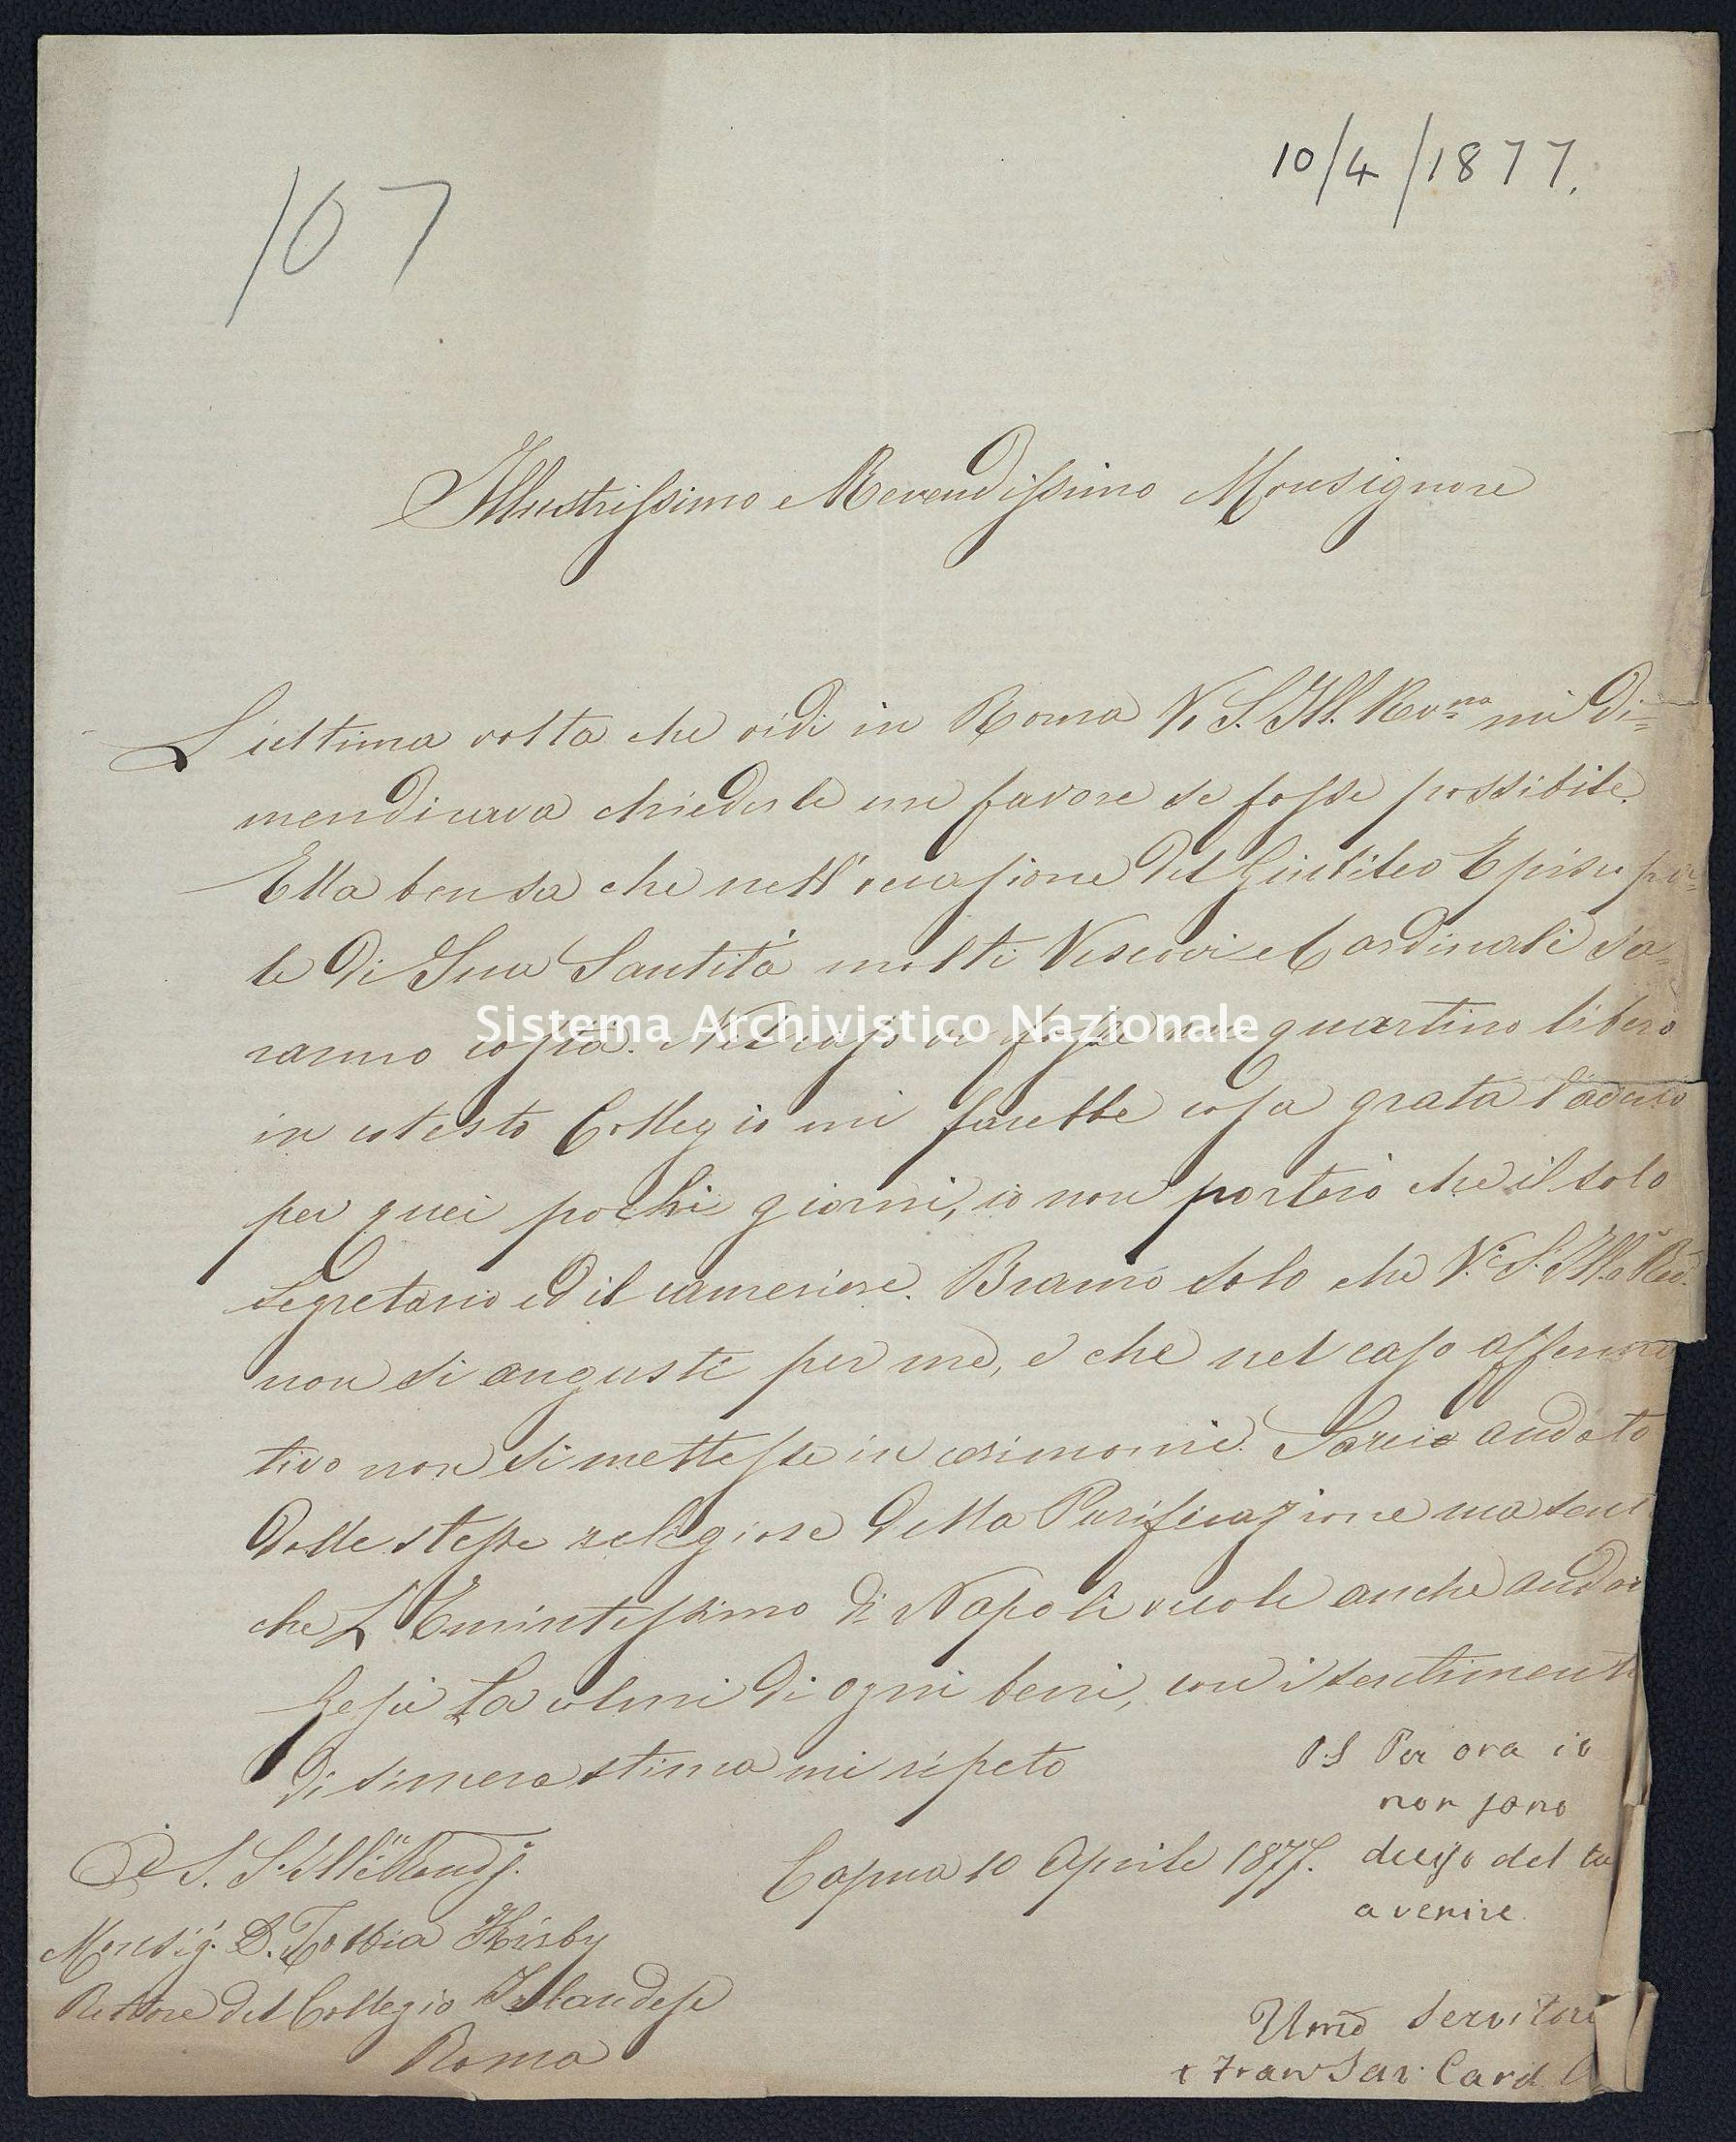 Pontificio Collegio Irlandese - Kirby_1877_107